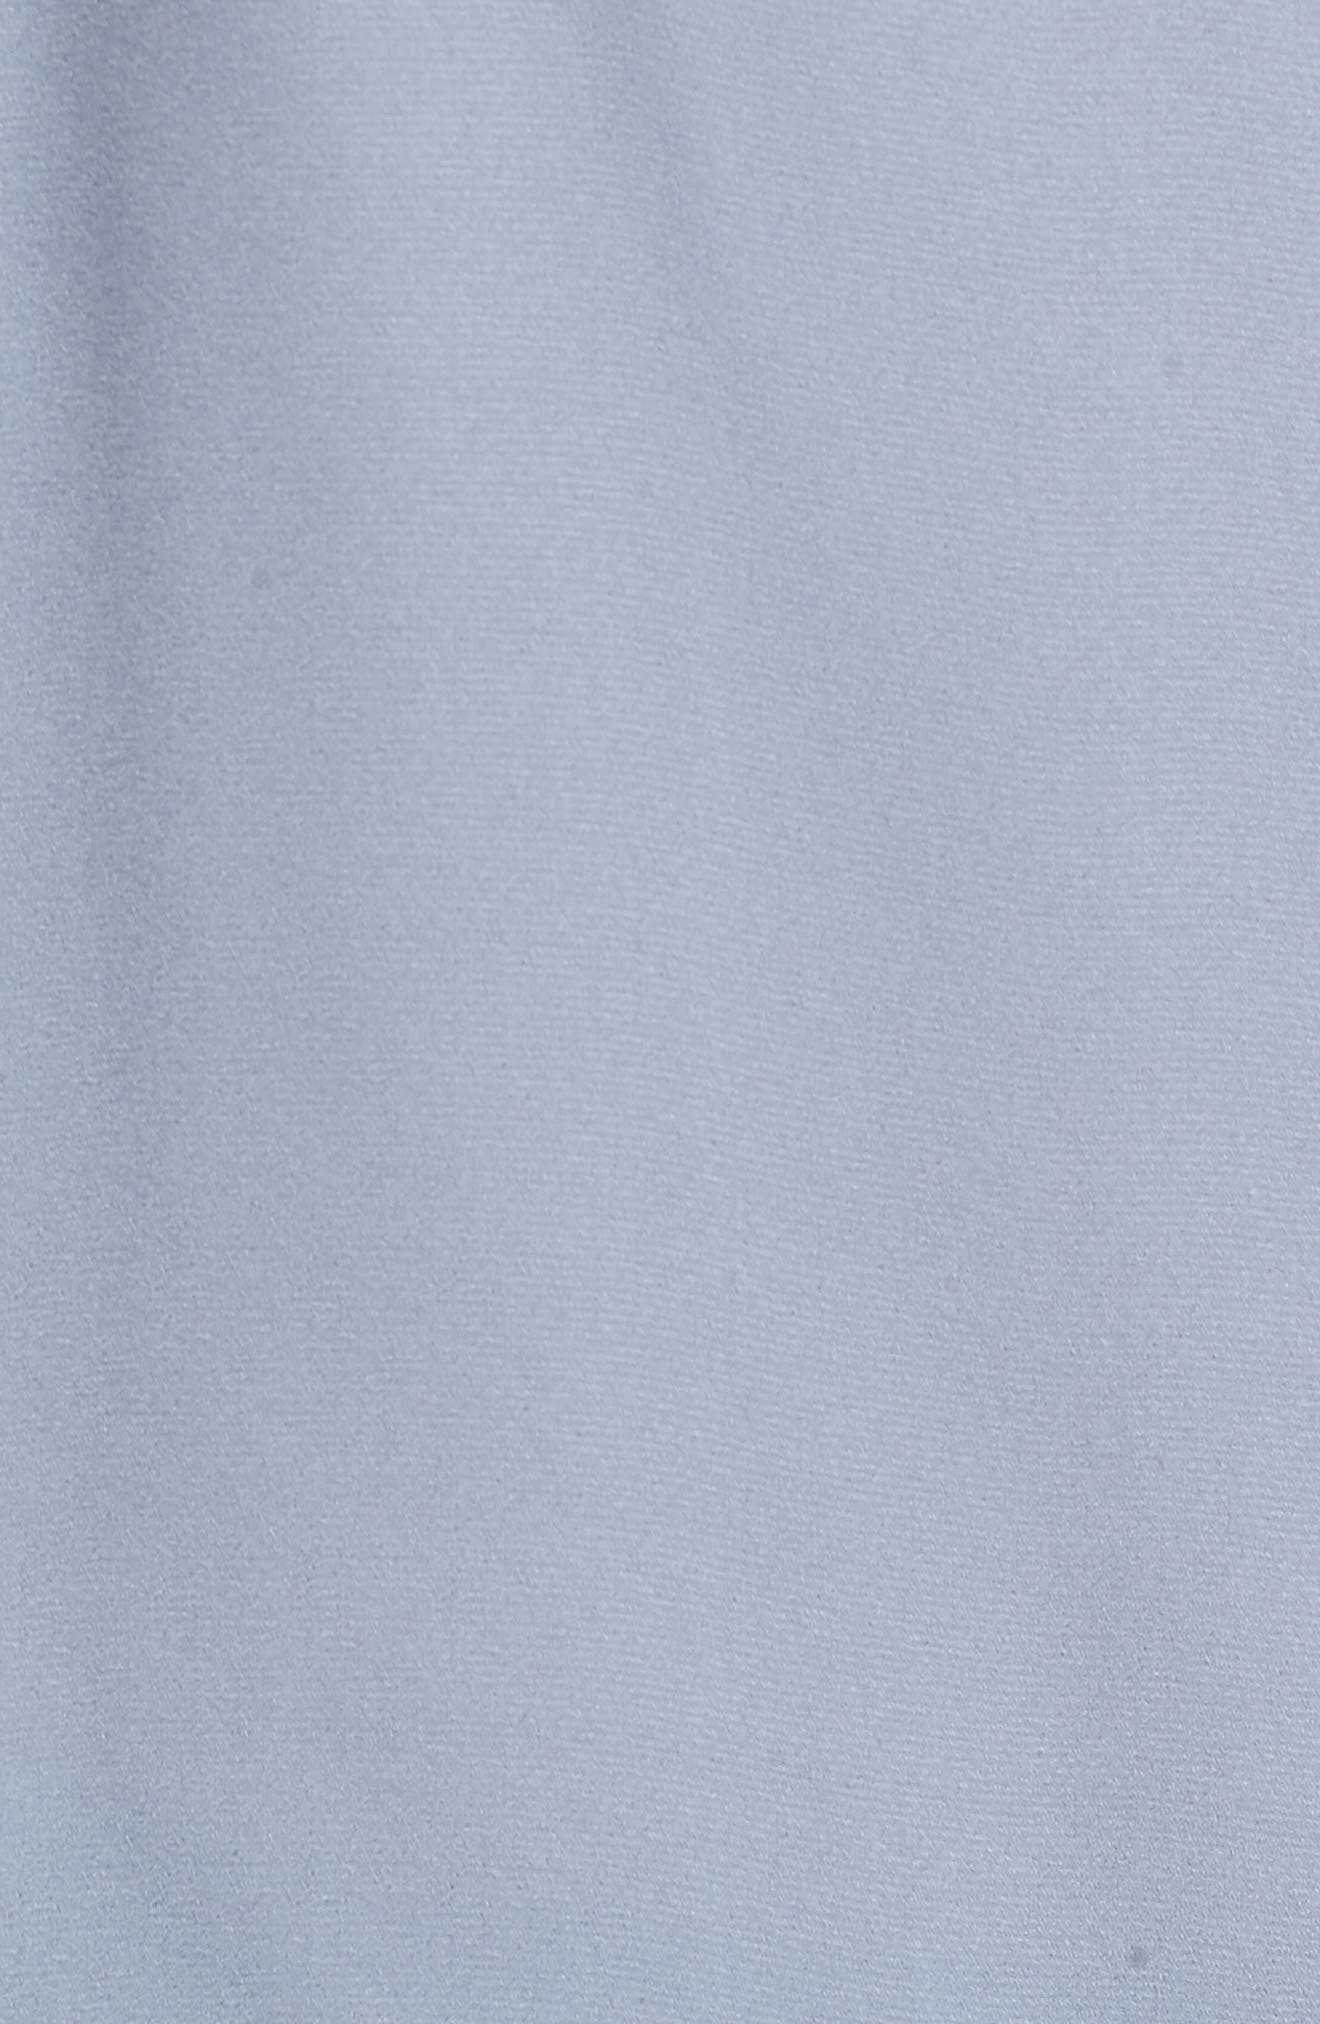 Ruffle Blouse,                             Alternate thumbnail 6, color,                             BLUE CHINTZ